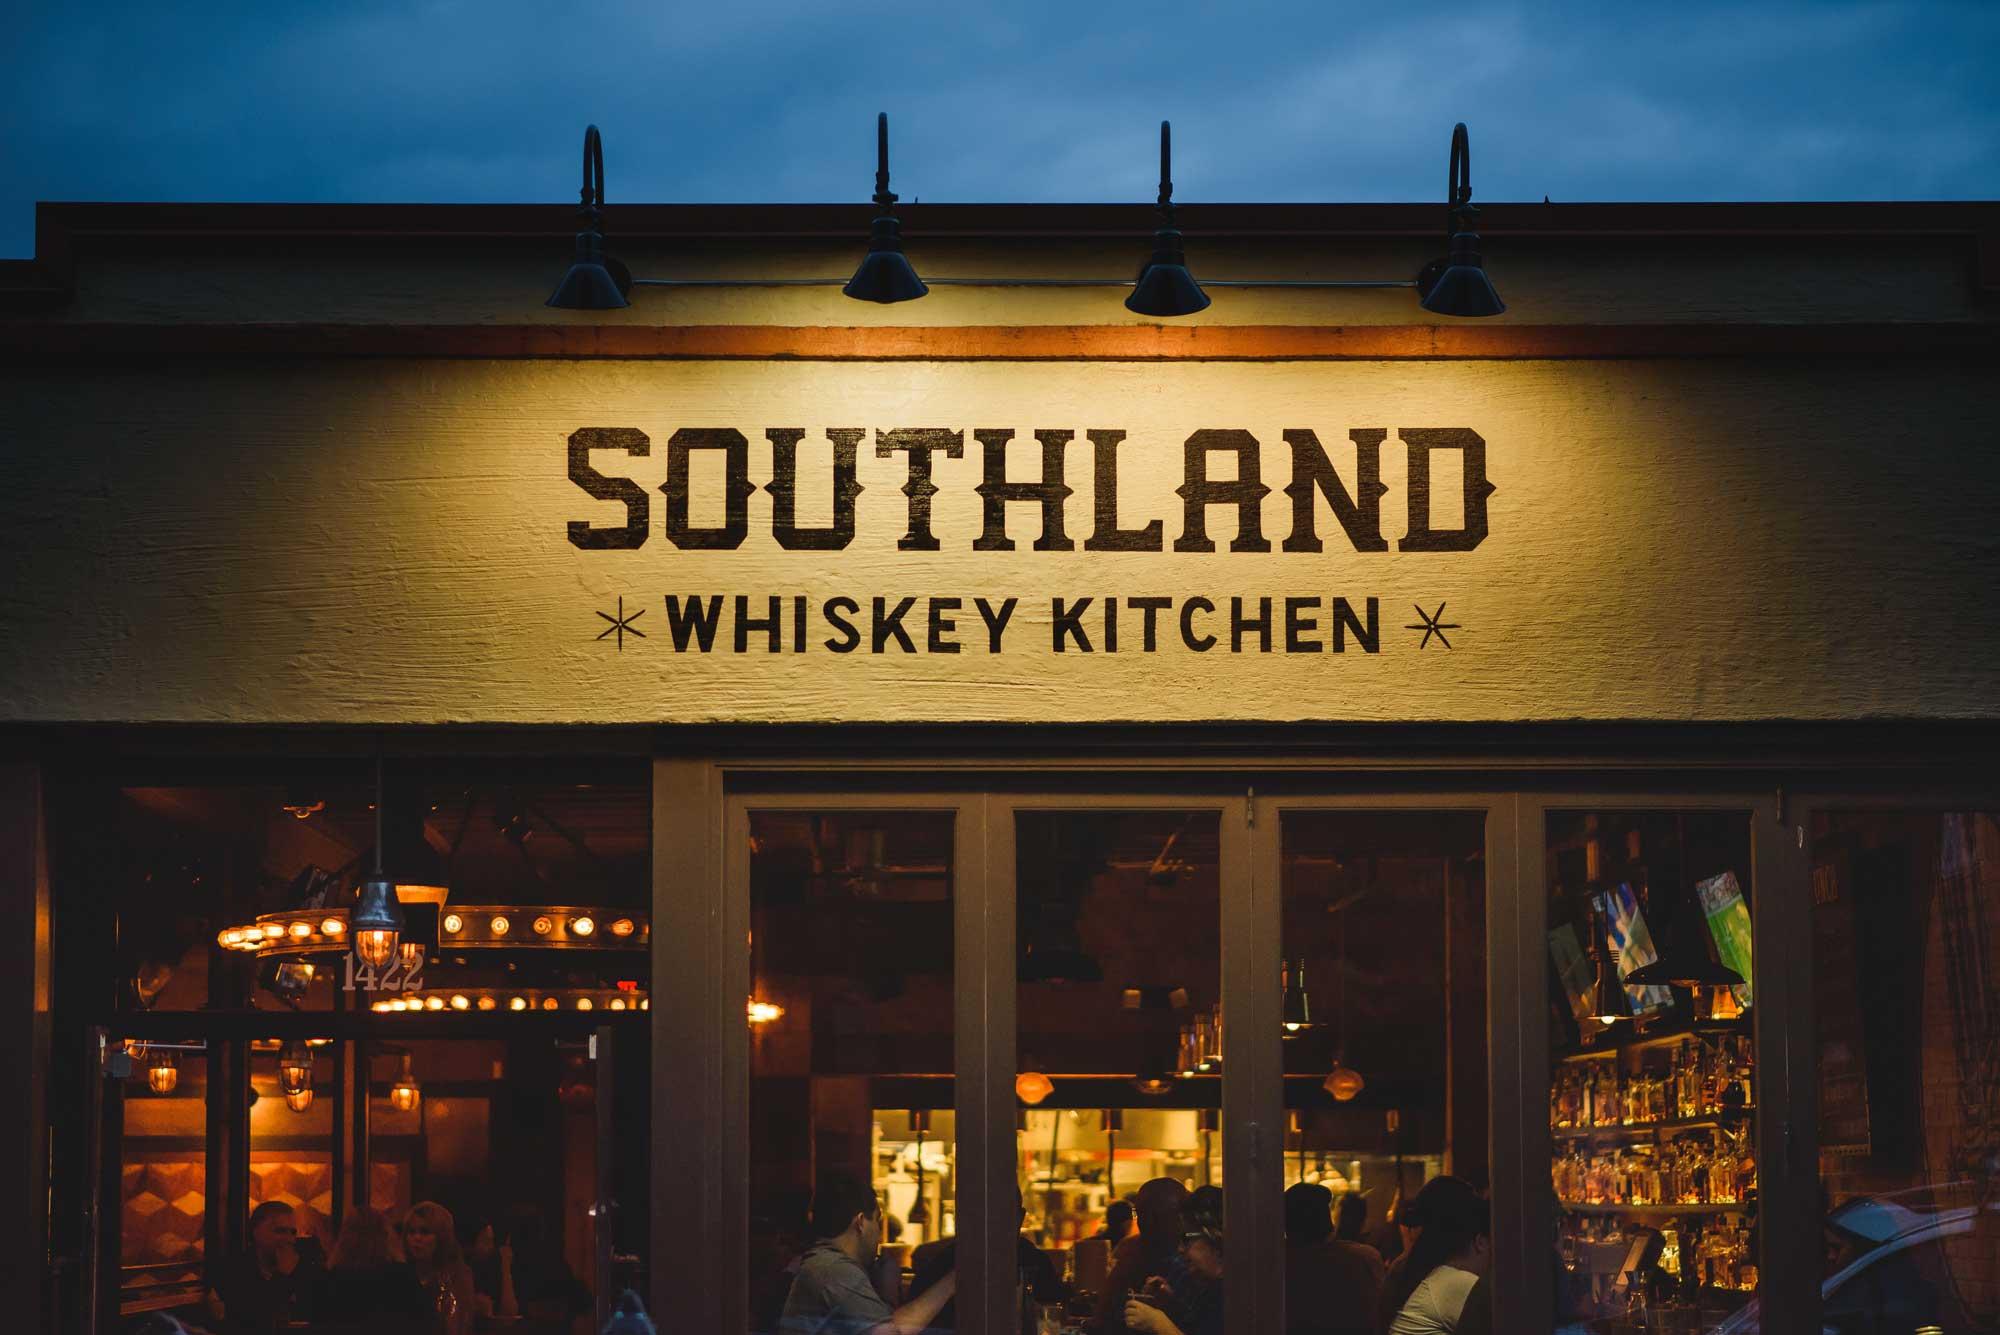 Southland Whiskey Kitchen